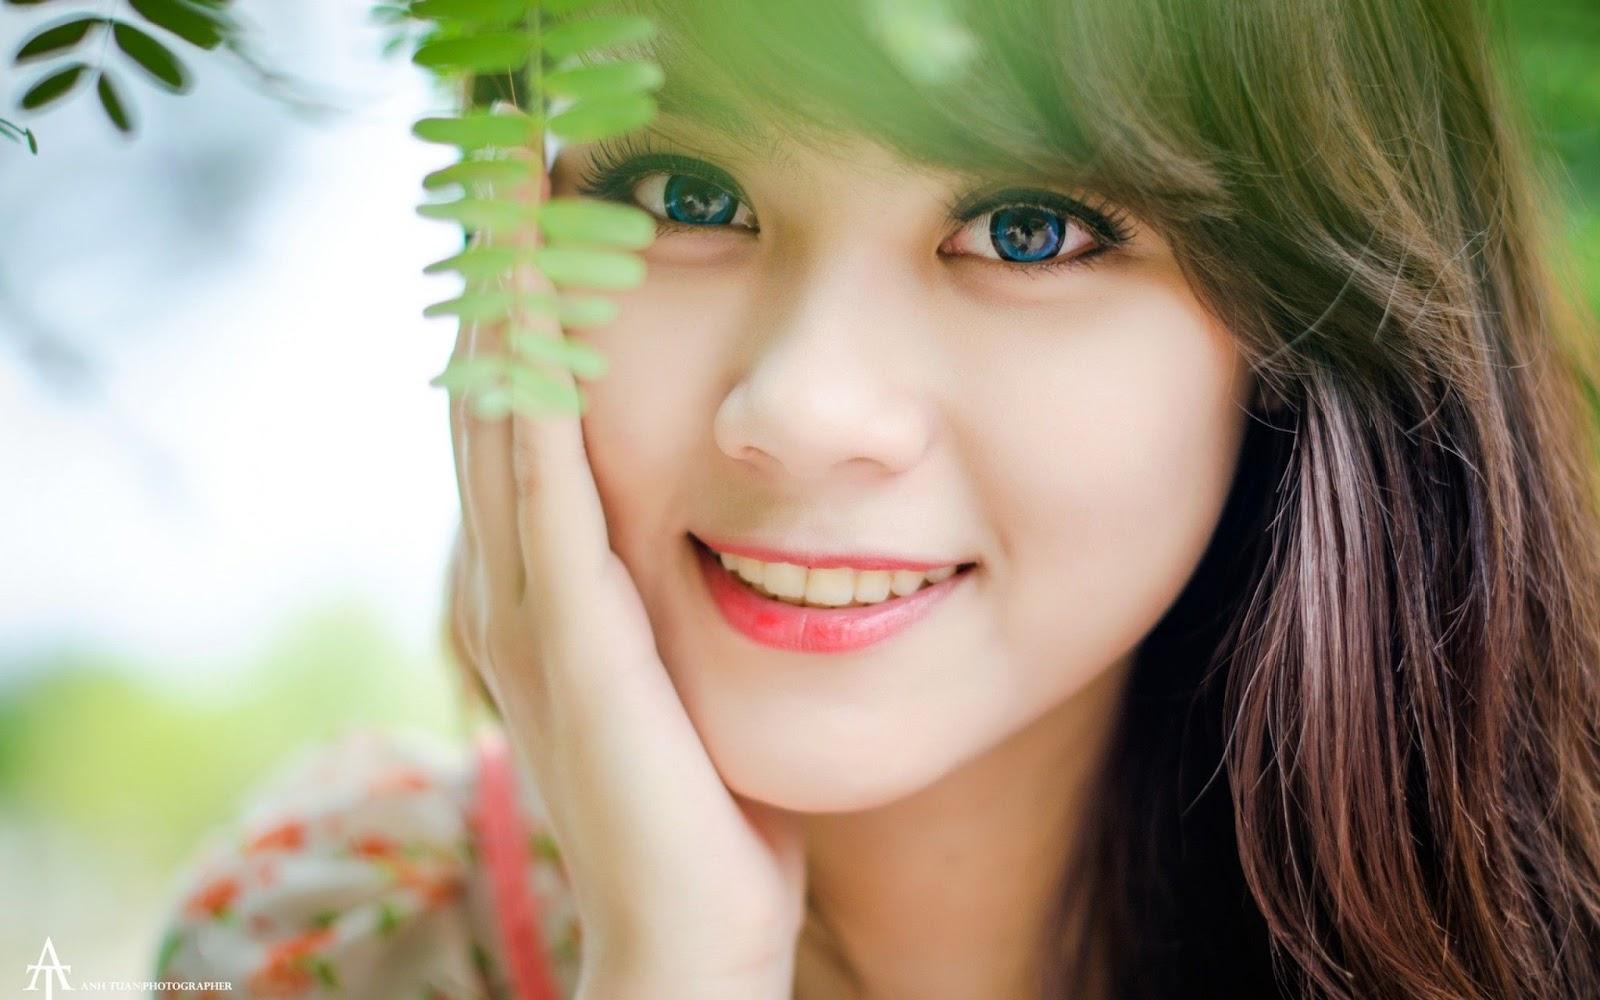 Gambar Wanita Cantik Untuk Wallpaper A1 Wallpaperz For You